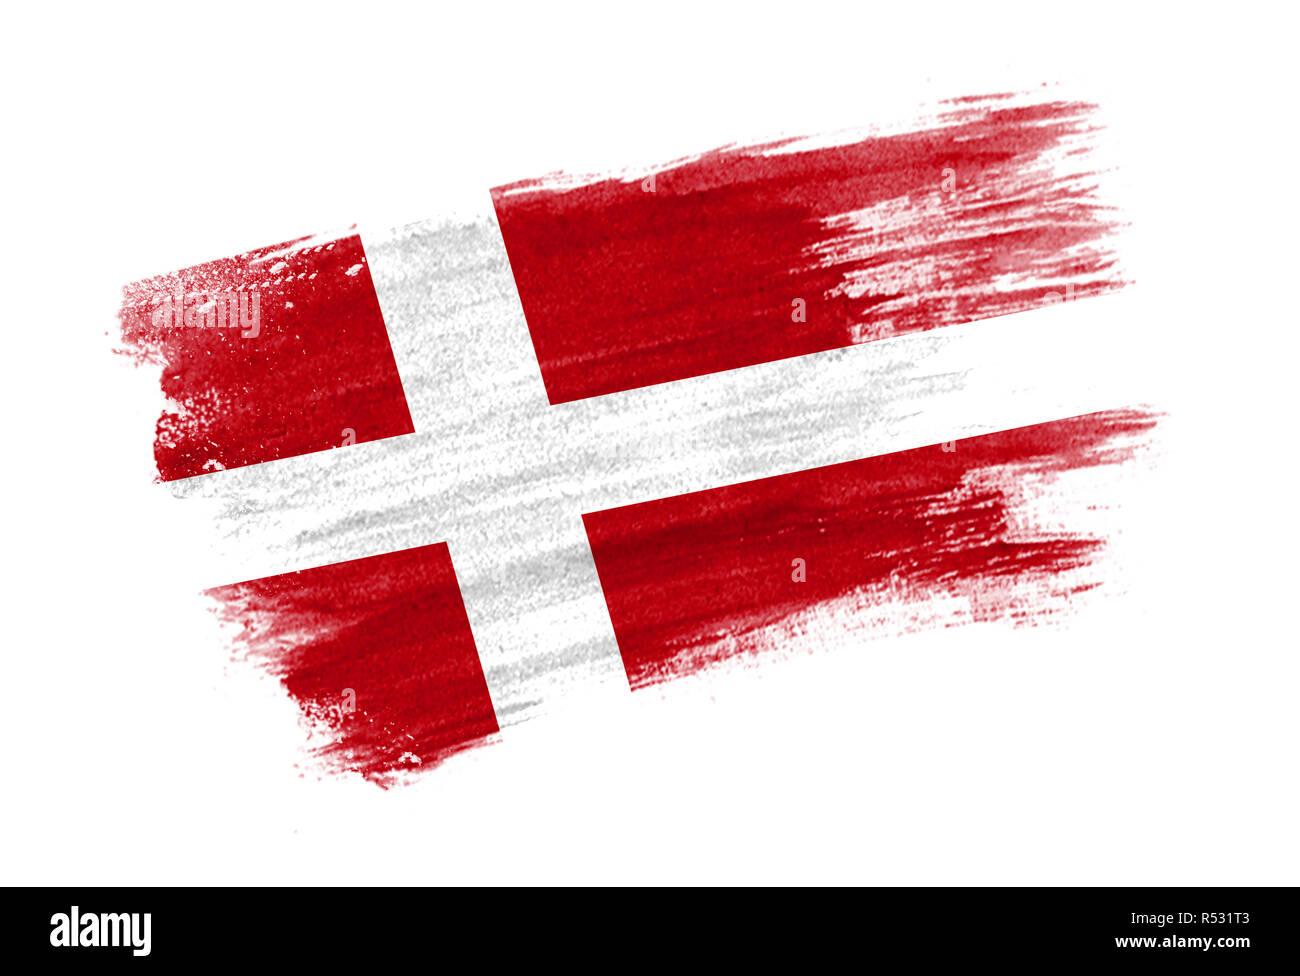 Pincel pabellón de Dinamarca. Estilo dibujados a mano pabellón de Dinamarca Foto de stock